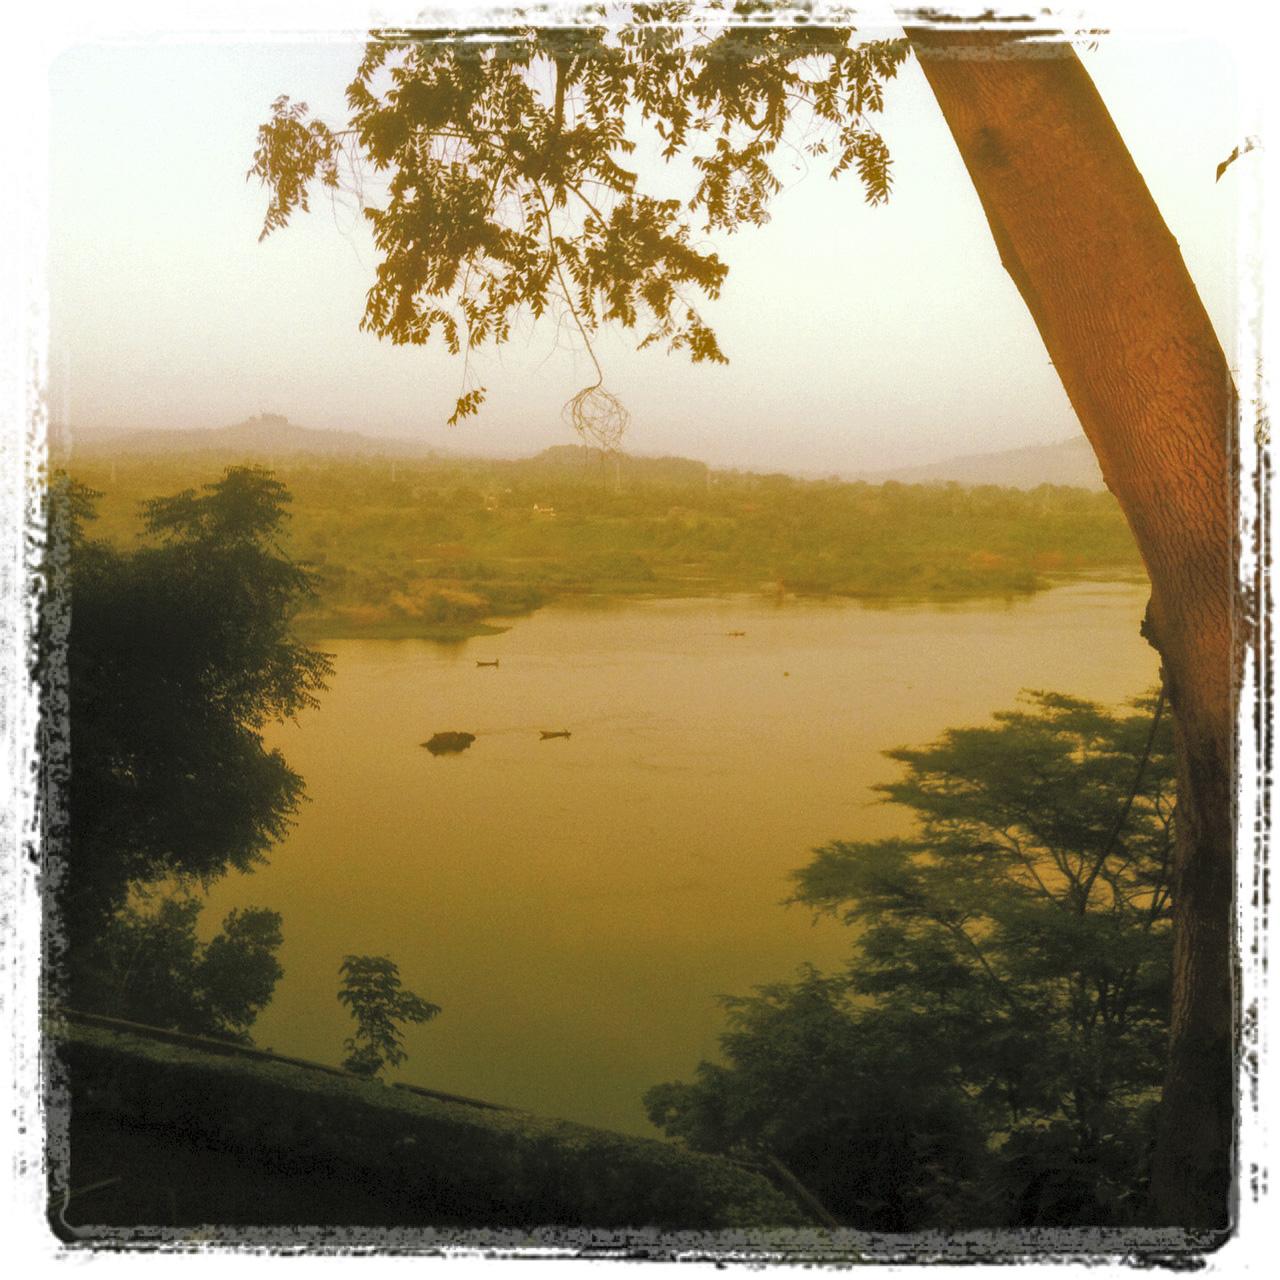 Good morning Nile 16.06.13 ©lowereast